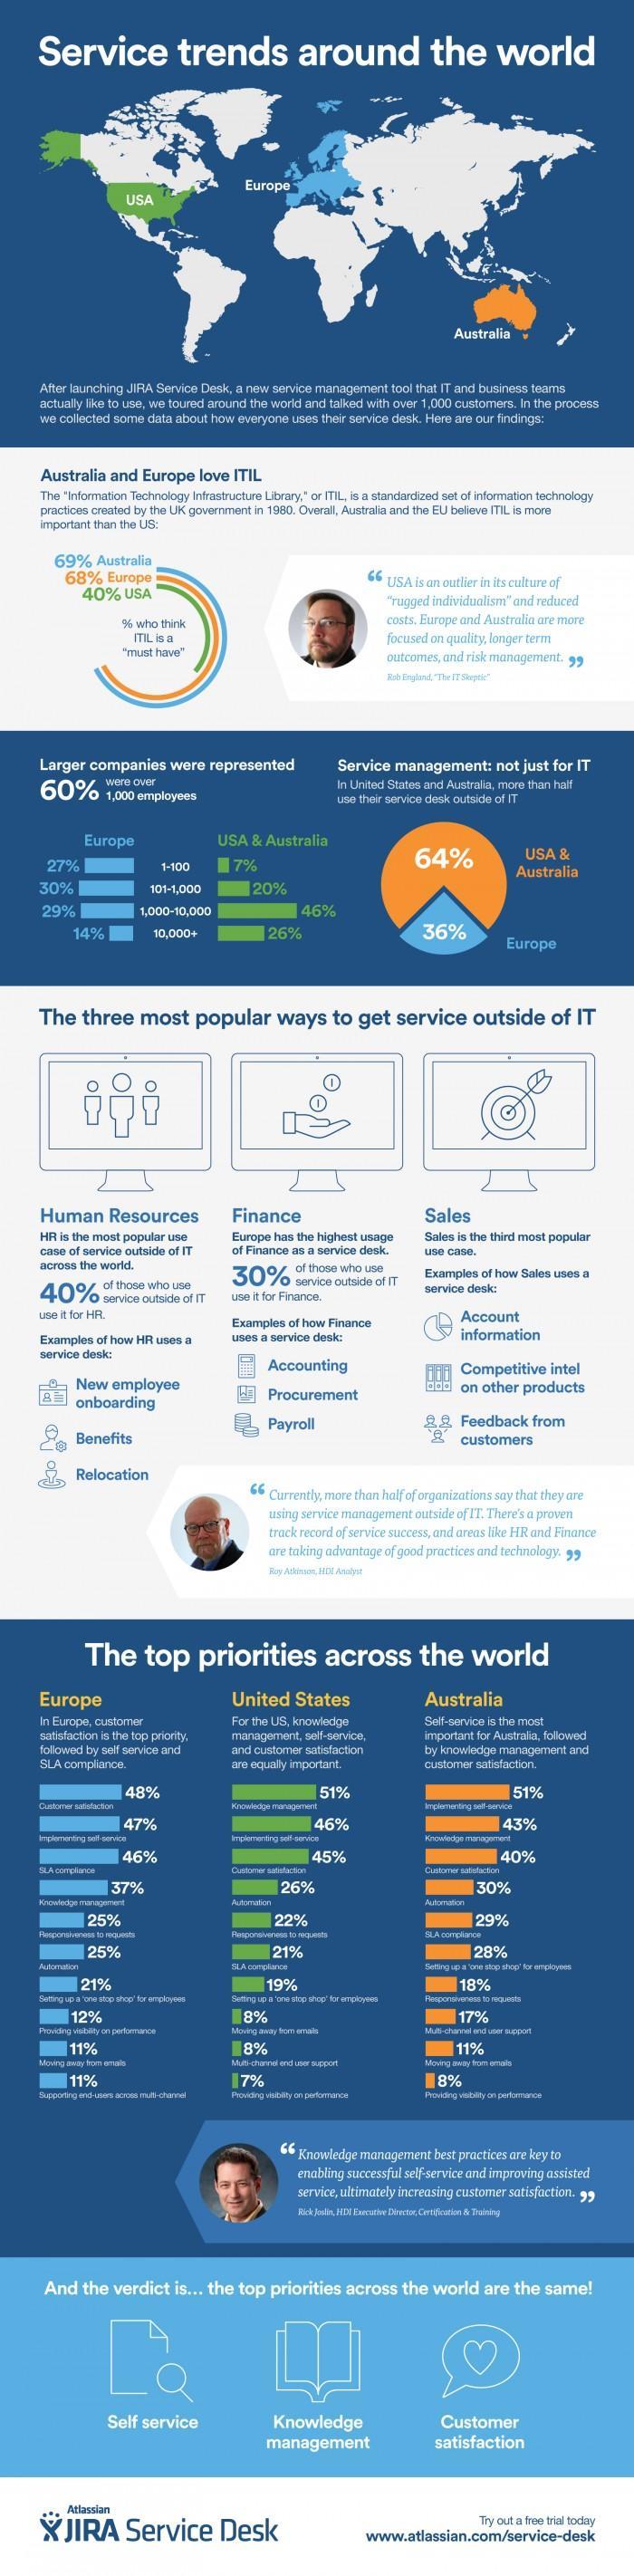 Service Trends Around The World